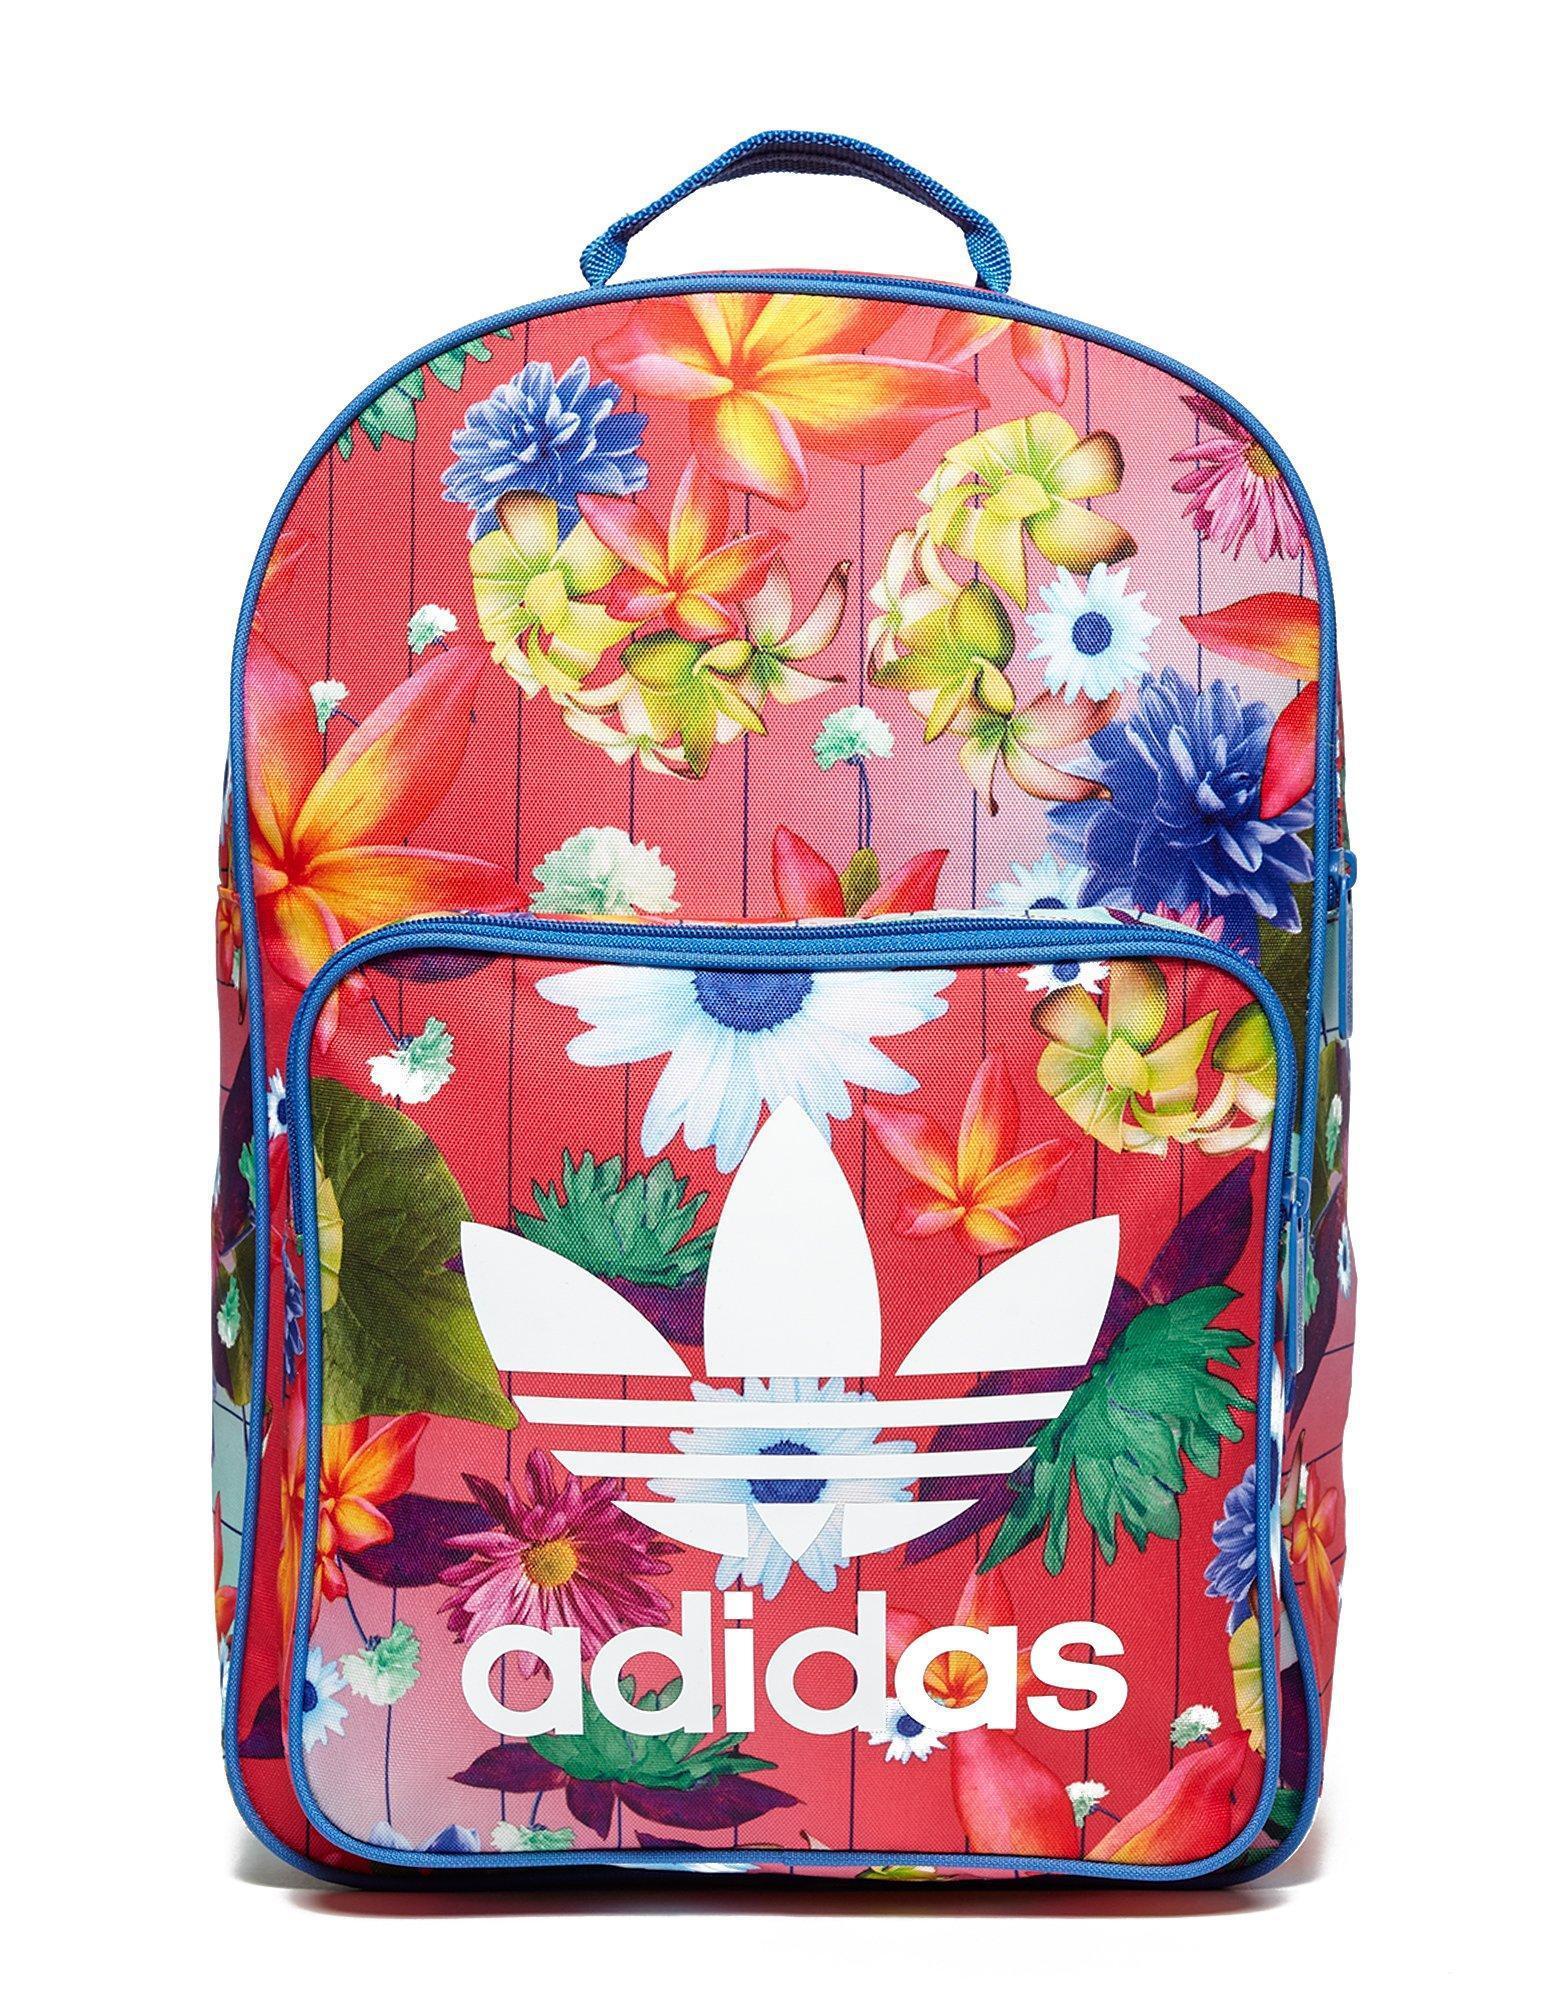 4ad738306d77 adidas Originals Classic Flower Backpack - Lyst